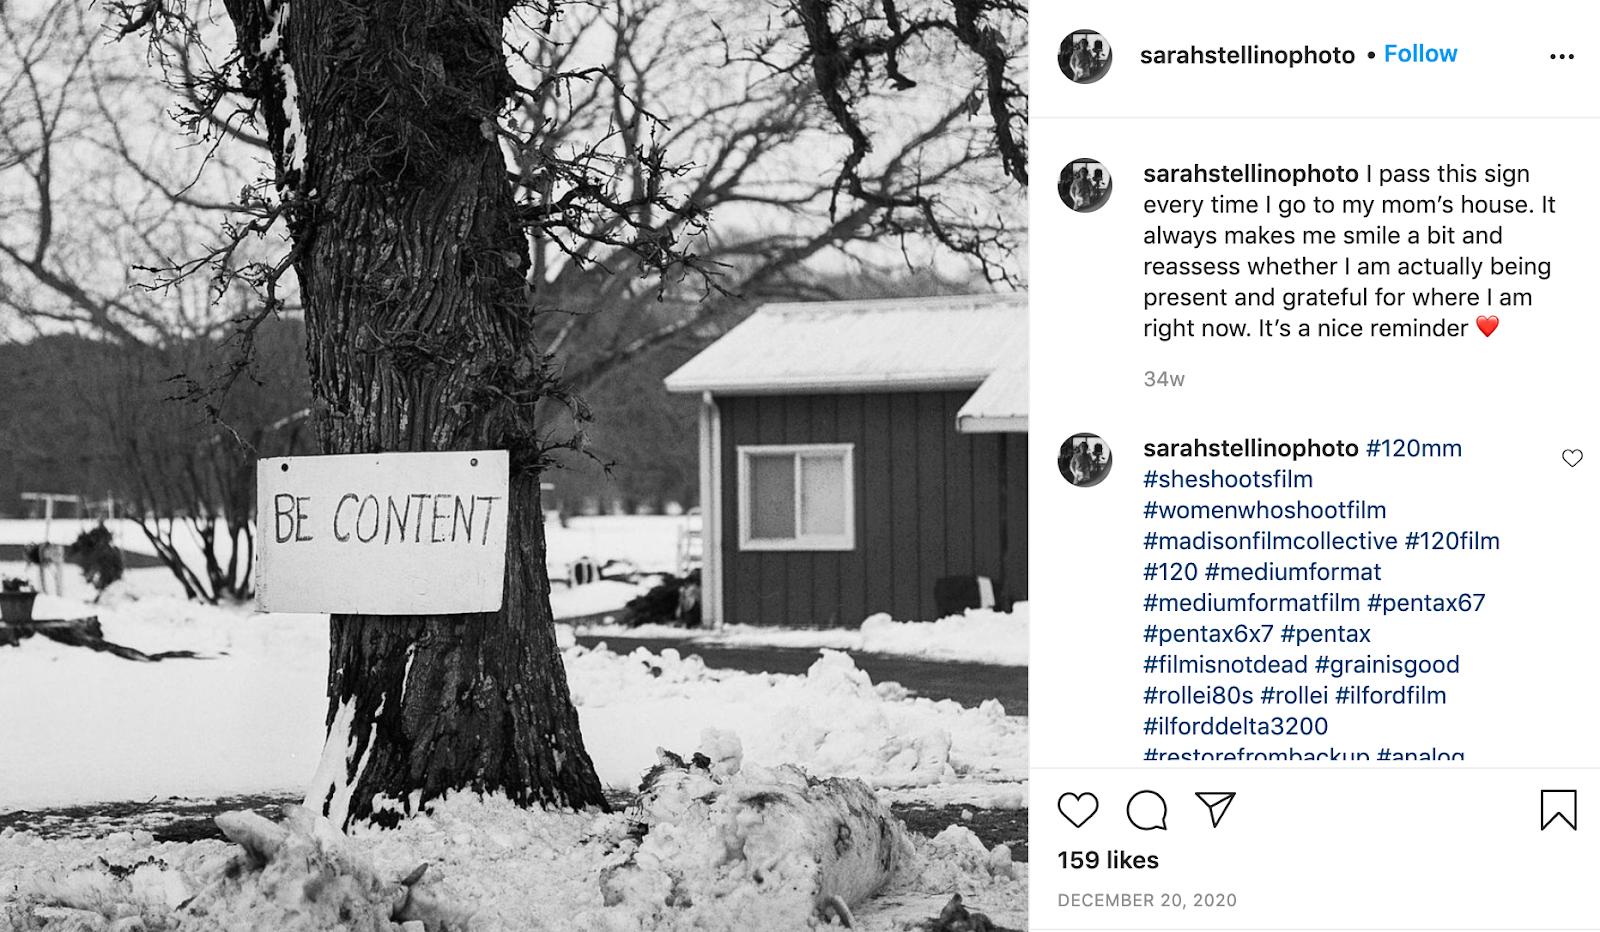 Photography by @sarahstellinophoto on Instagram